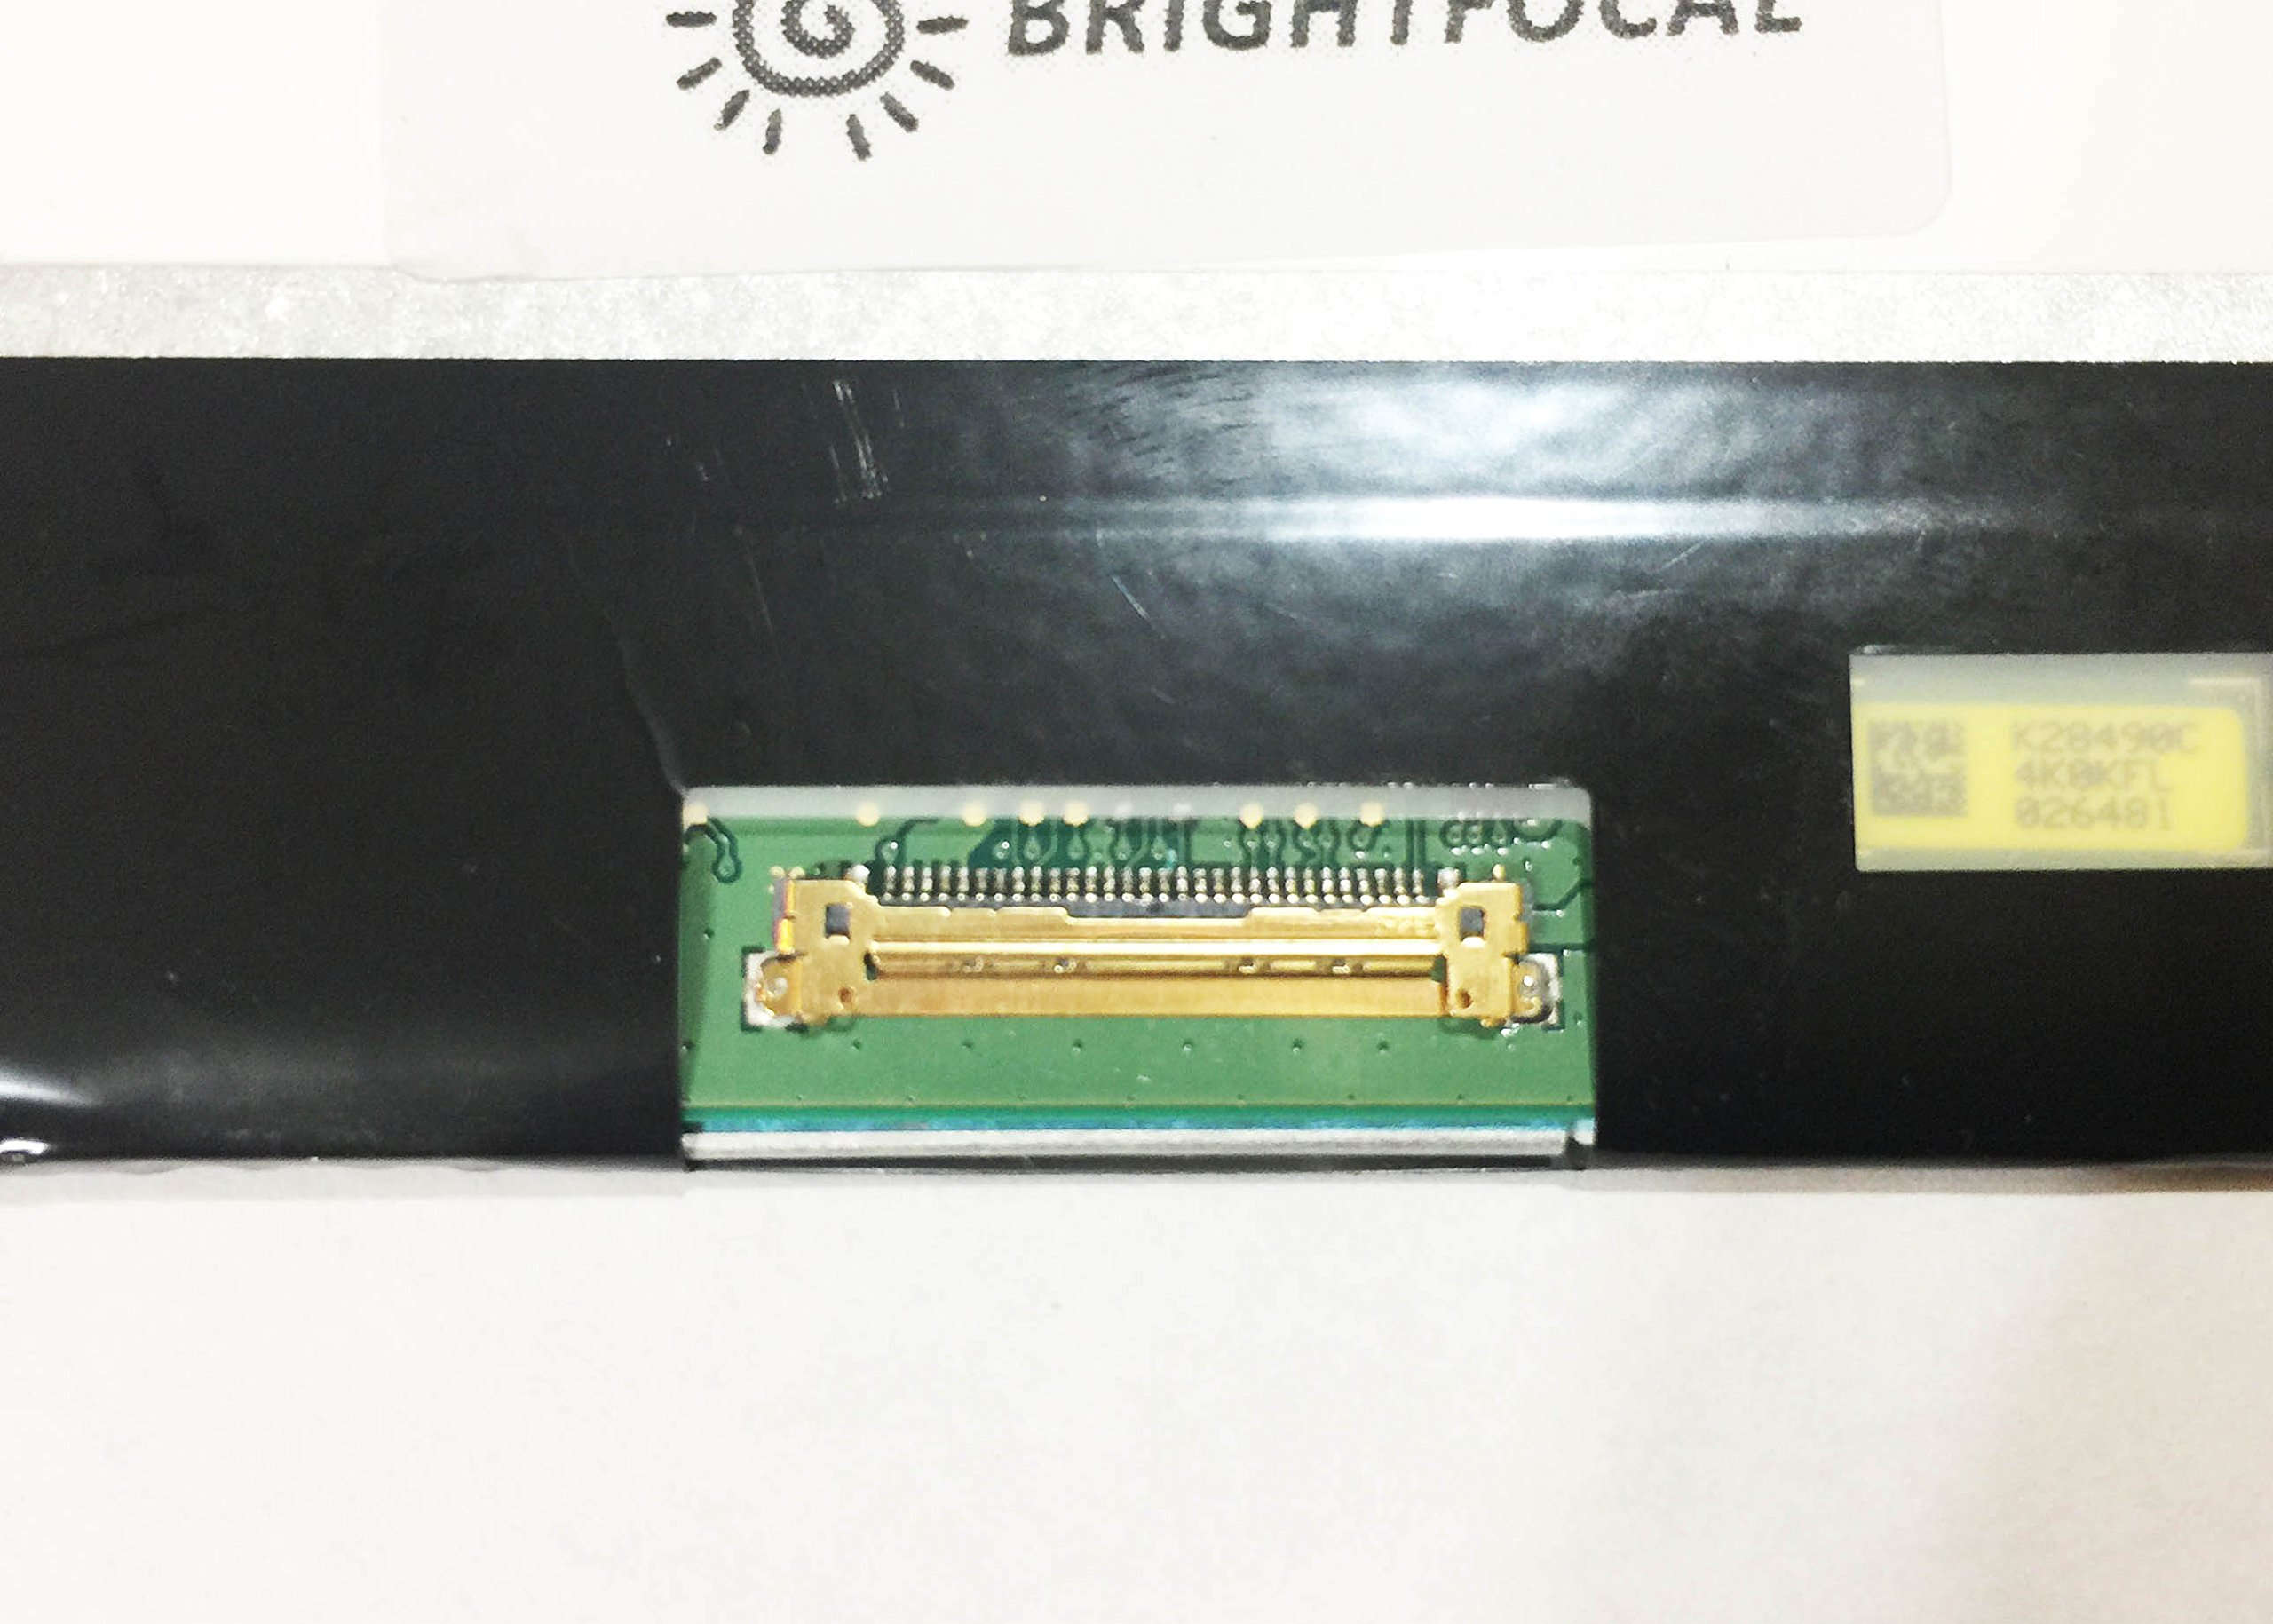 BRIGHTFOCAL New Screen for IBM Lenovo Thinkpad T460s T460p T460 E475 E470c E470 14.0'' Full-HD FHD 1920 x 1080 1080p LED Replacement LCD Screen Display by BRIGHTFOCAL (Image #3)